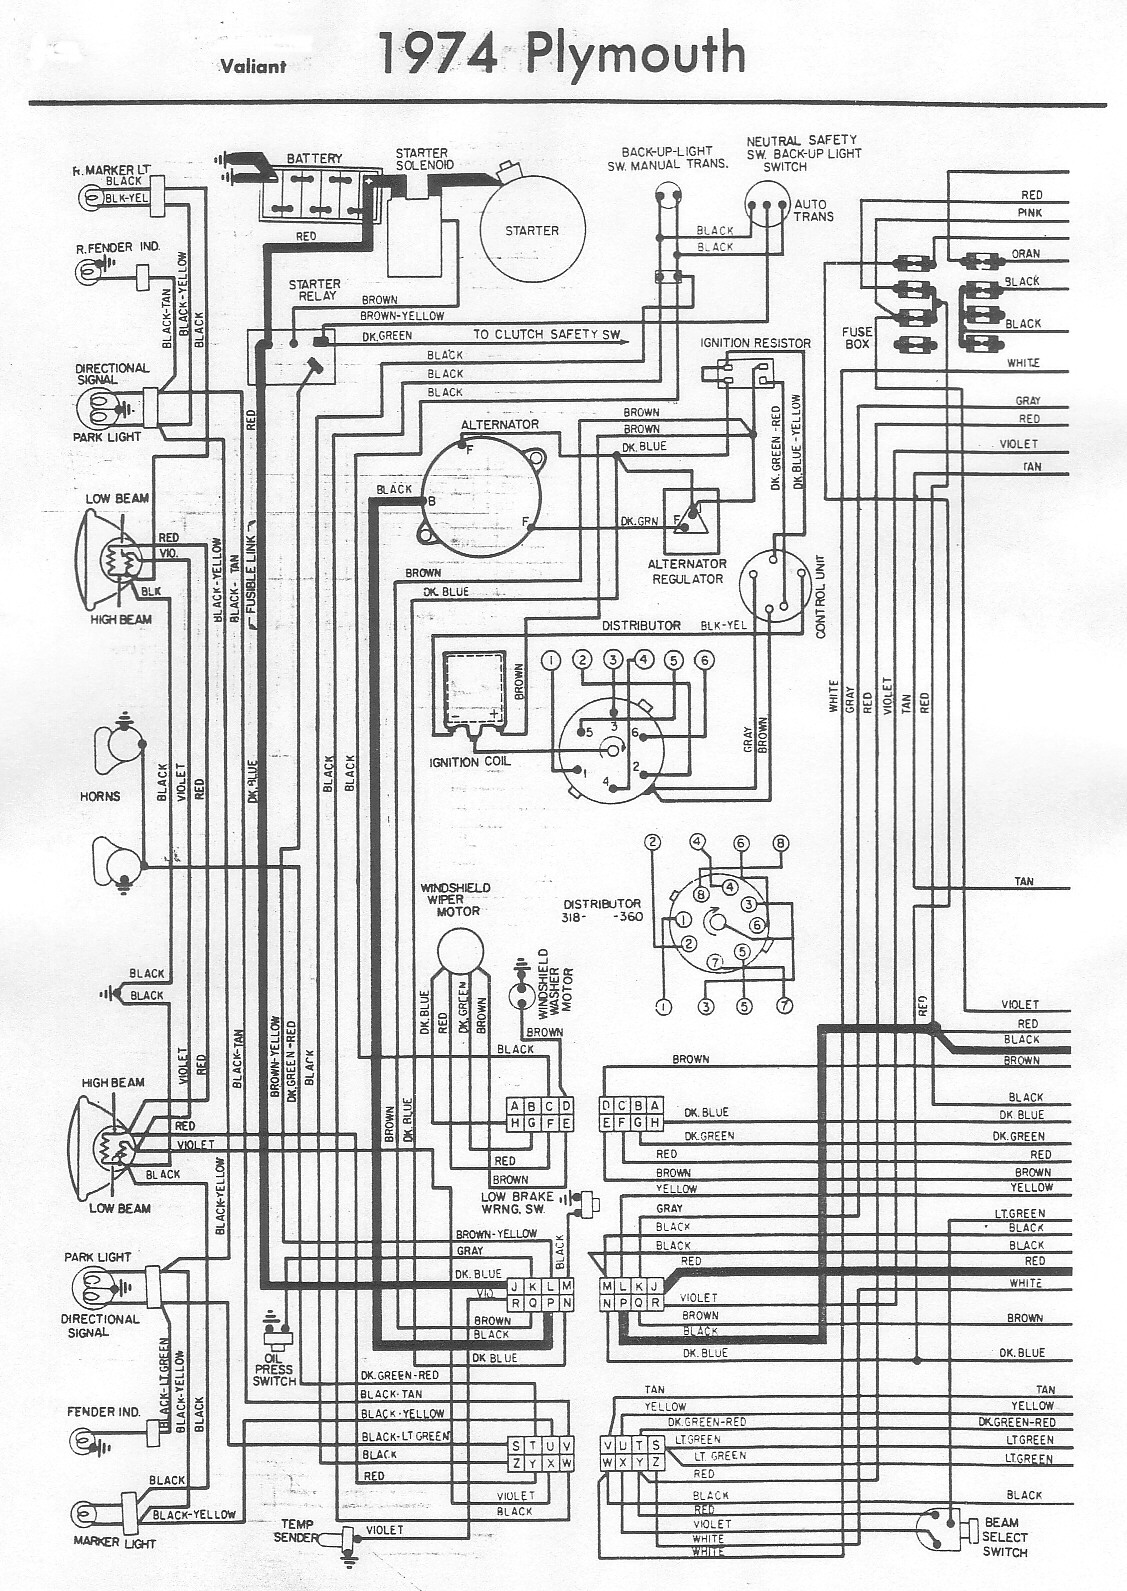 ML_3829] Diagram On 1968 Barracuda Wiring Harness Diagram Get Free Image  About Wiring DiagramOliti Hemt Onica Stic Over Ostr Bios Hendil Mohammedshrine Librar Wiring 101